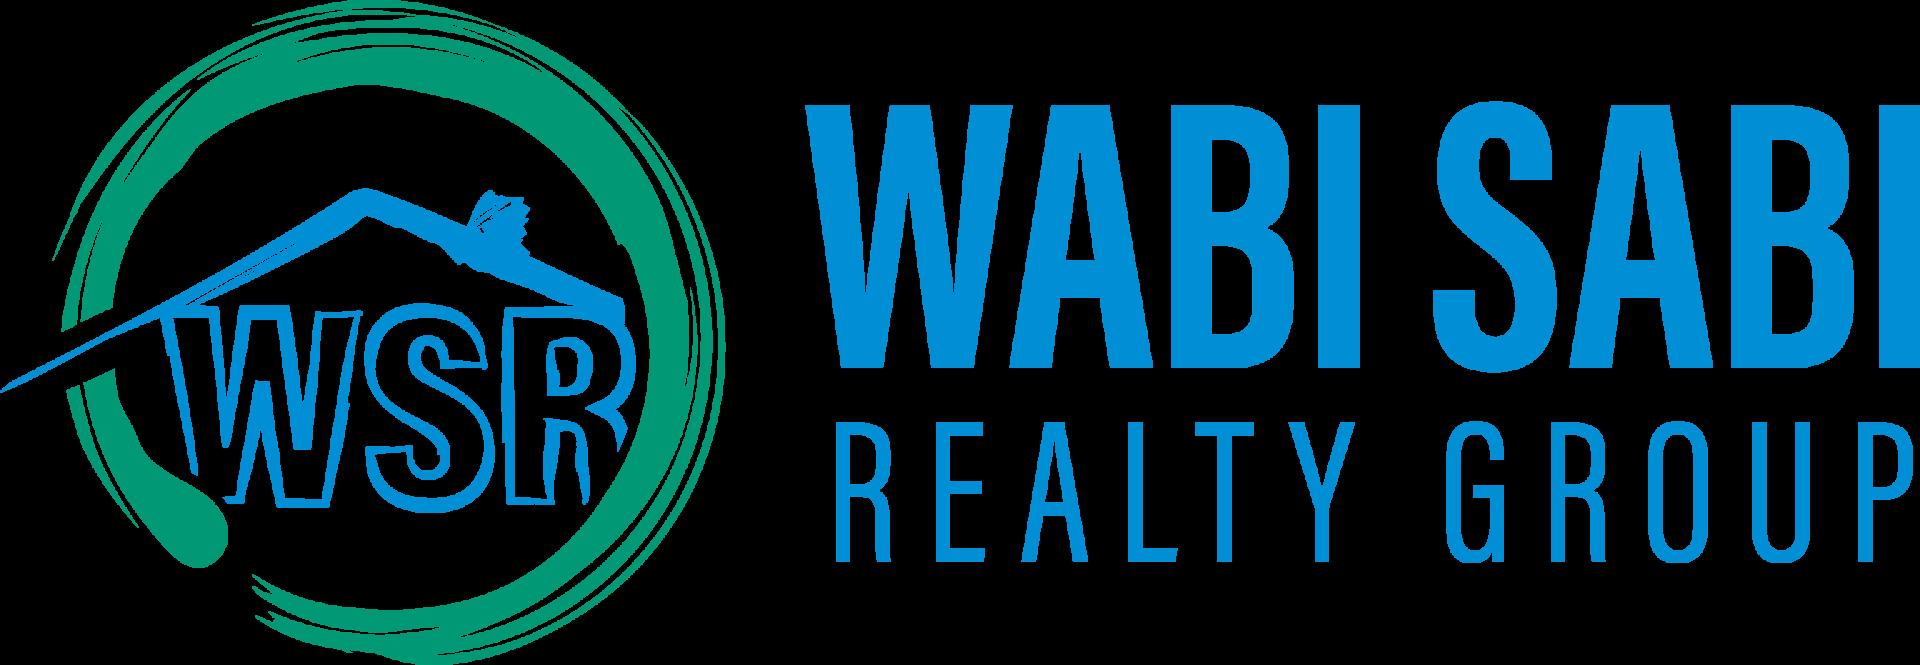 Wabi Sabi Realty Group - Houston, TX 77056 - (281)306-5721 | ShowMeLocal.com